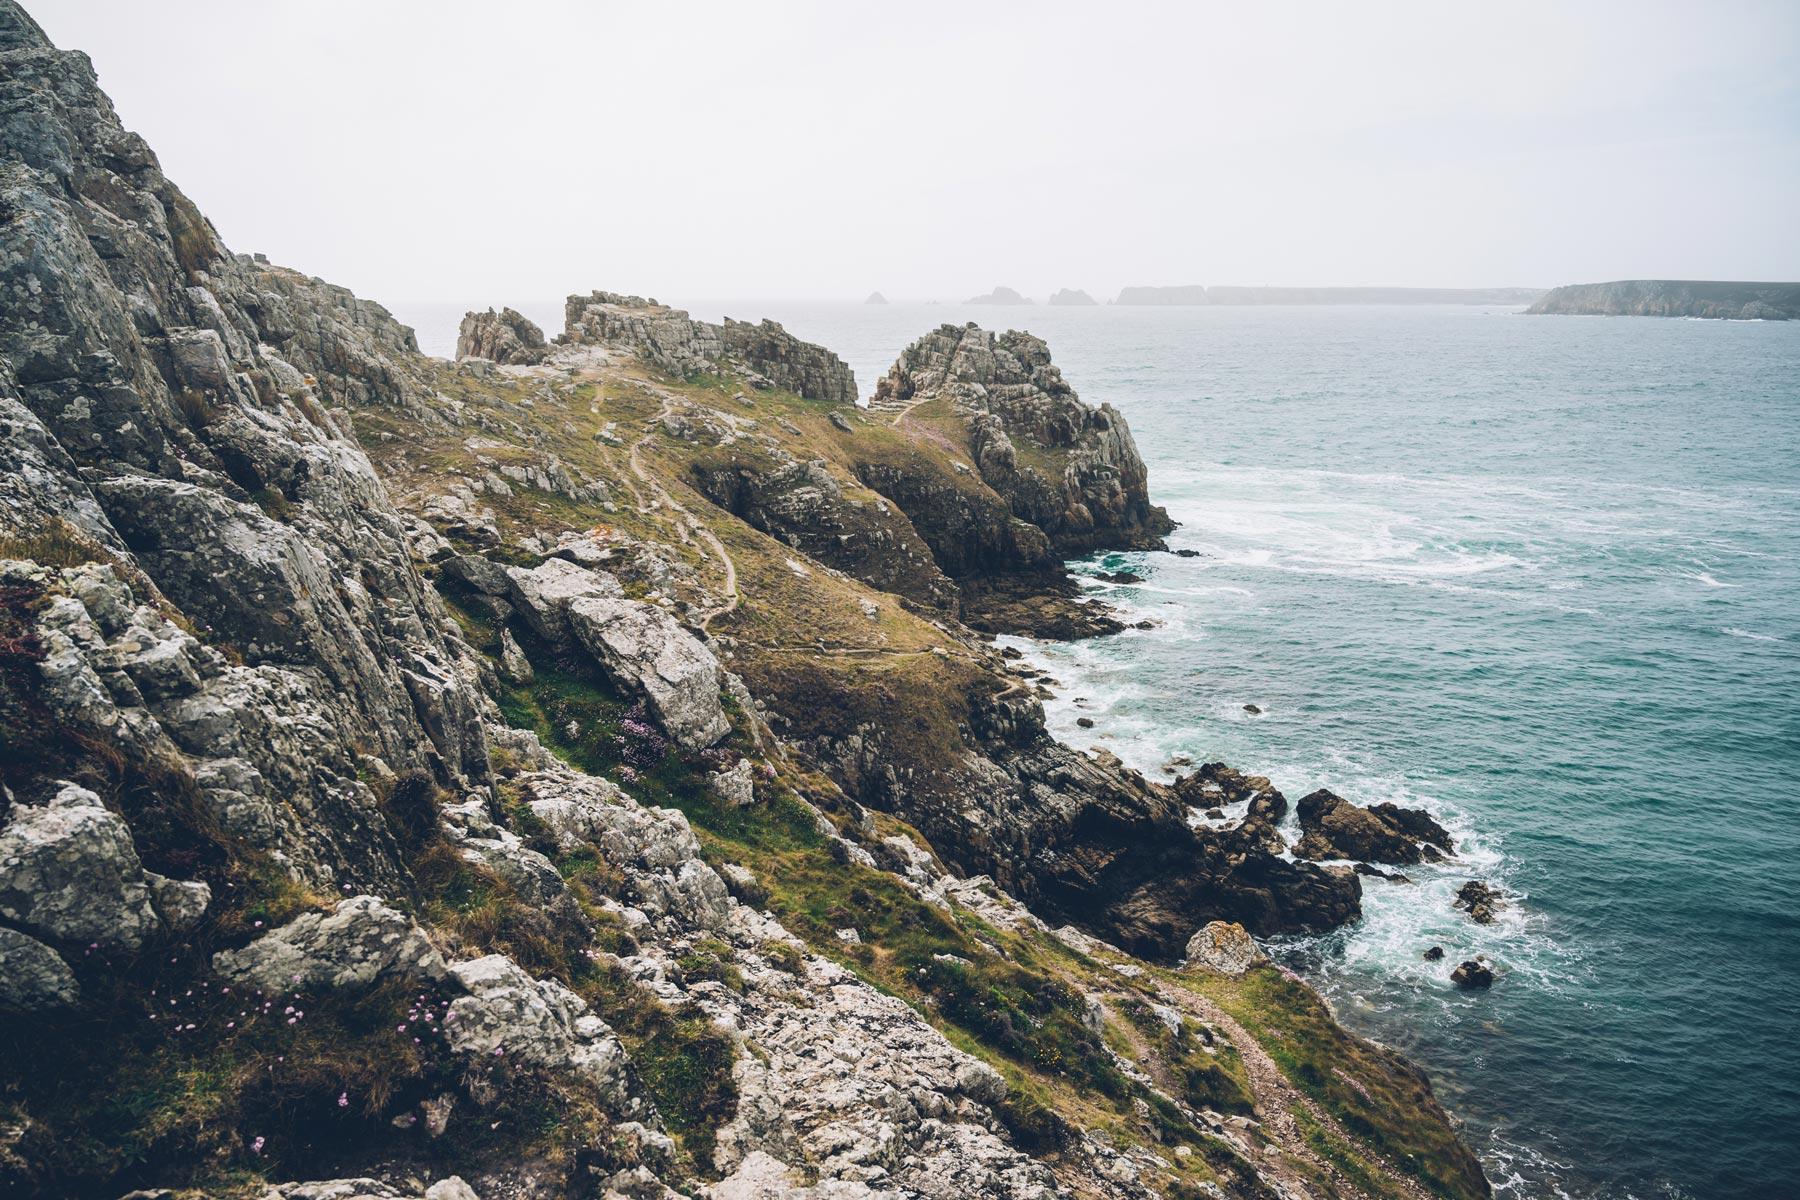 Pointe de Dinan, Crozon